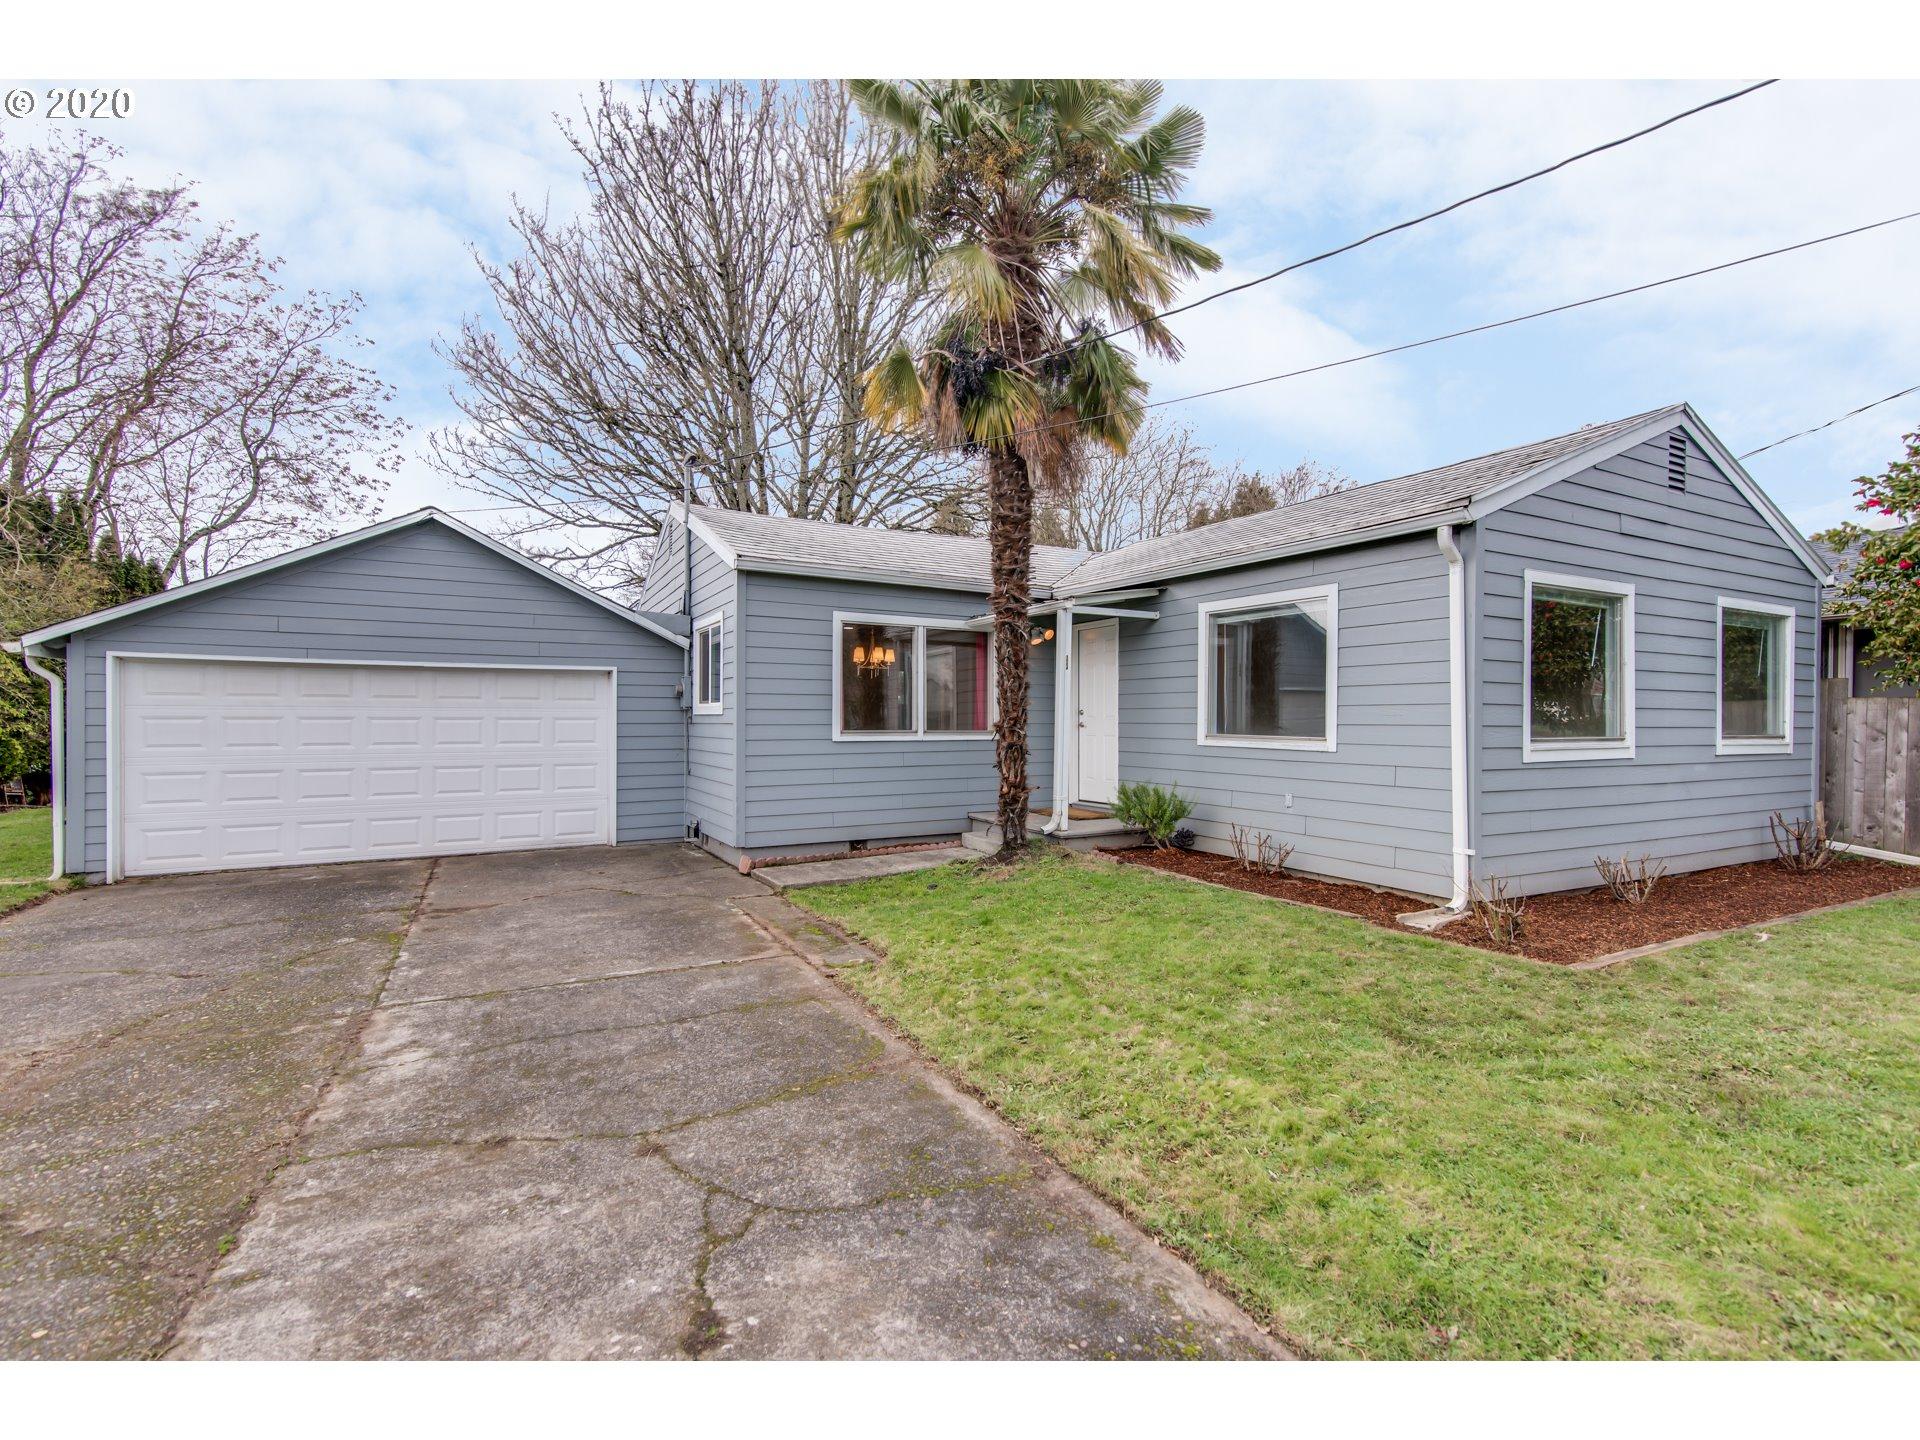 3004  Harney St, Vancouver, WA 98660